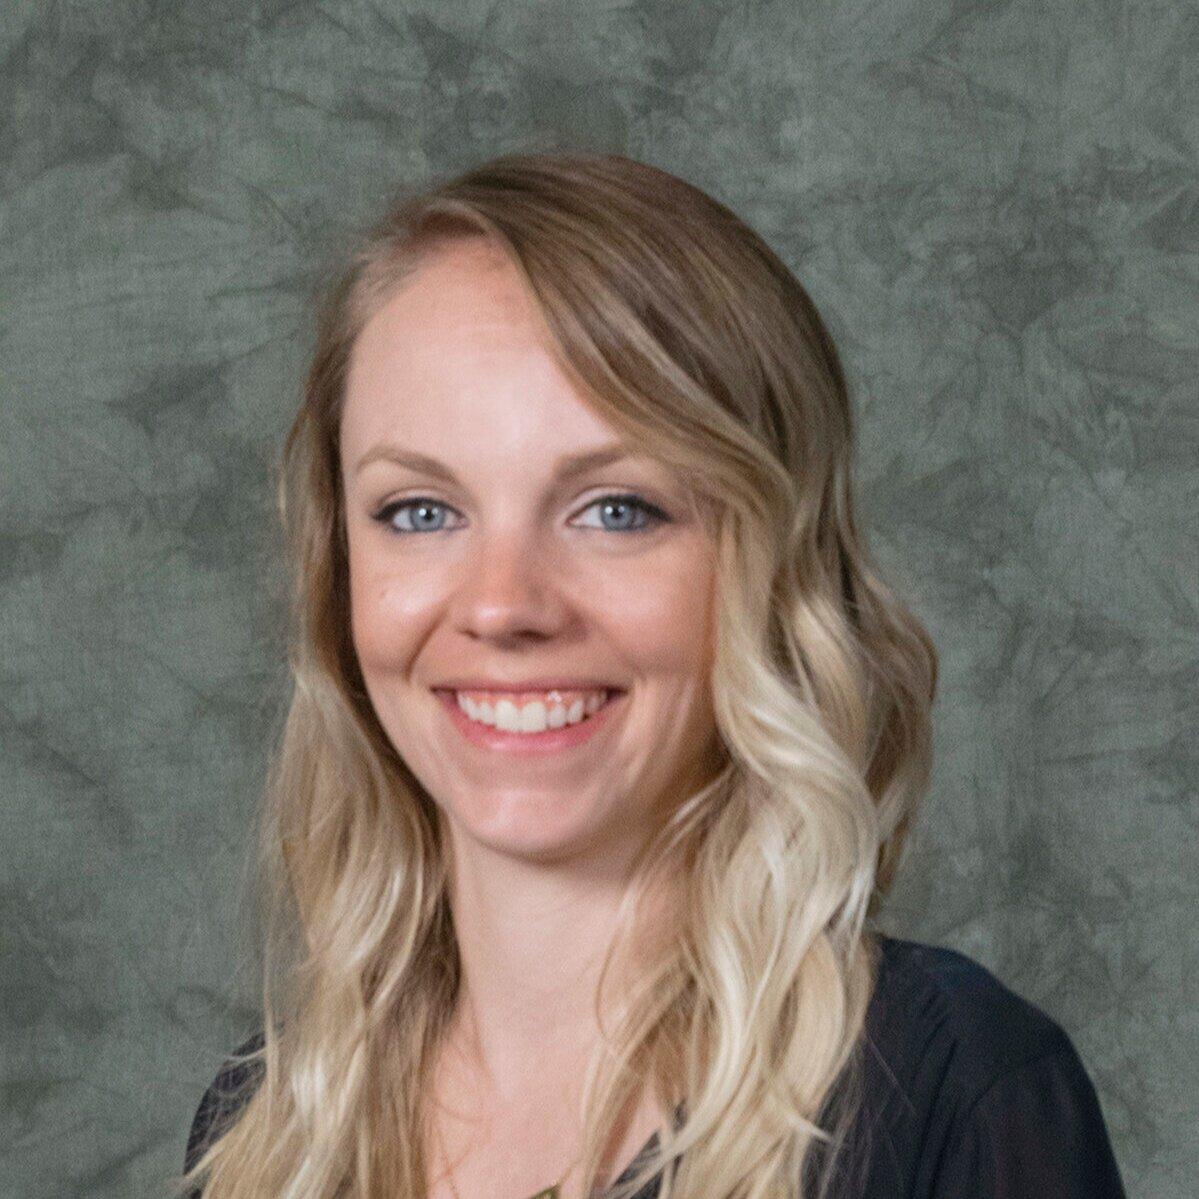 Samantha Tomer   Therapist, Brynn Cicippio, LMFT & Associates and Academic, Advisor, Penn State Abington